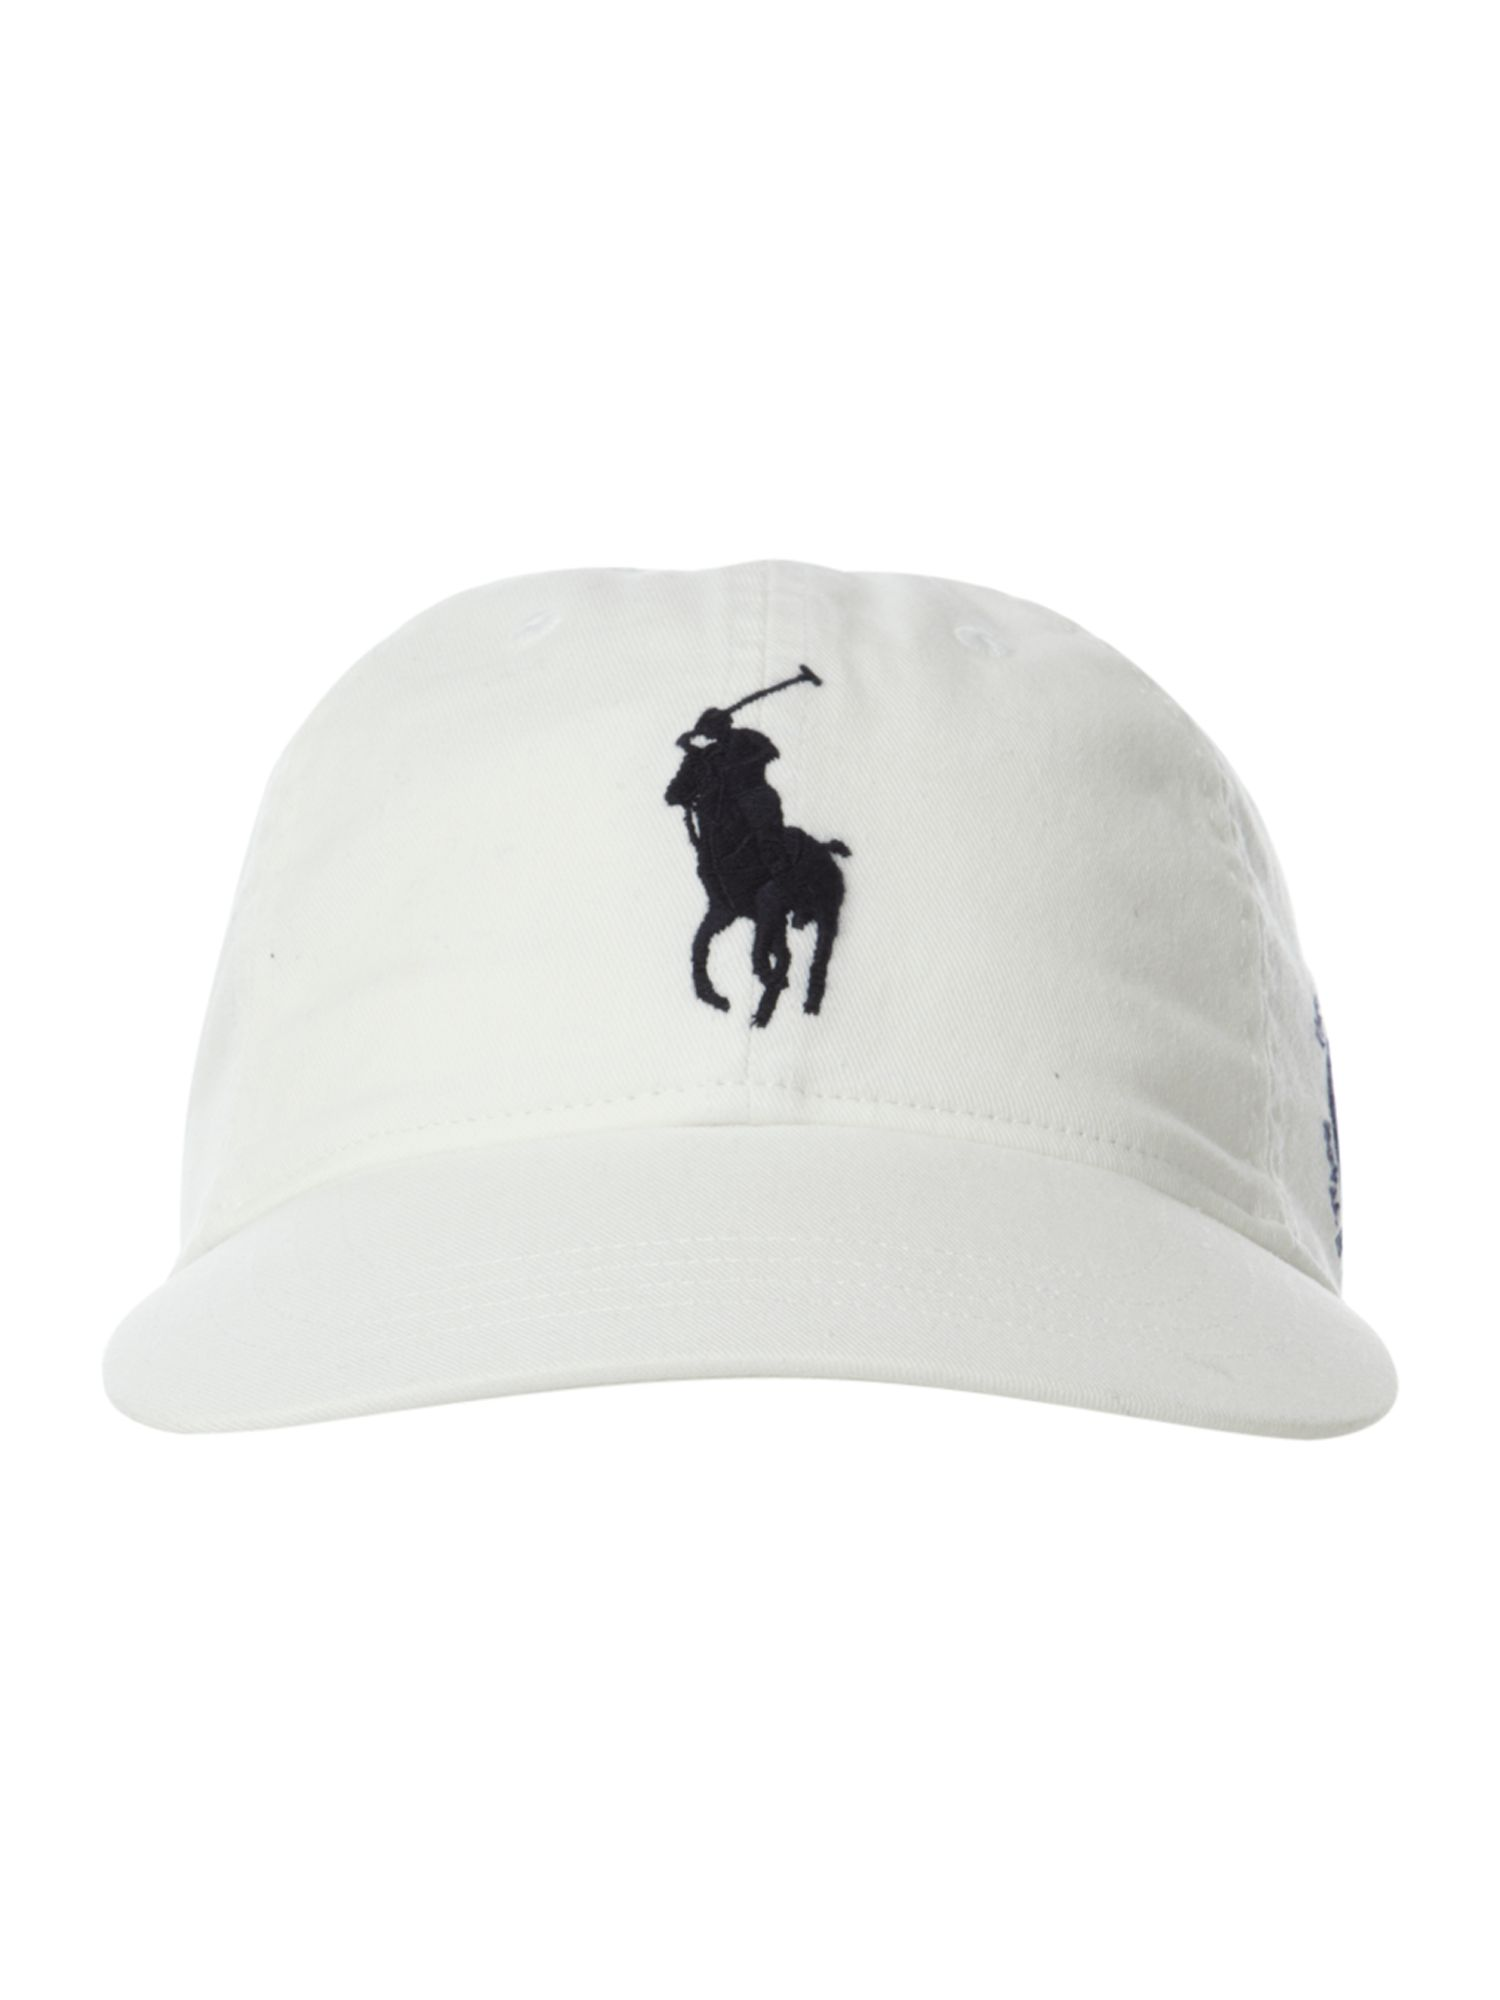 ralph lauren golf the open cap in white for men lyst. Black Bedroom Furniture Sets. Home Design Ideas